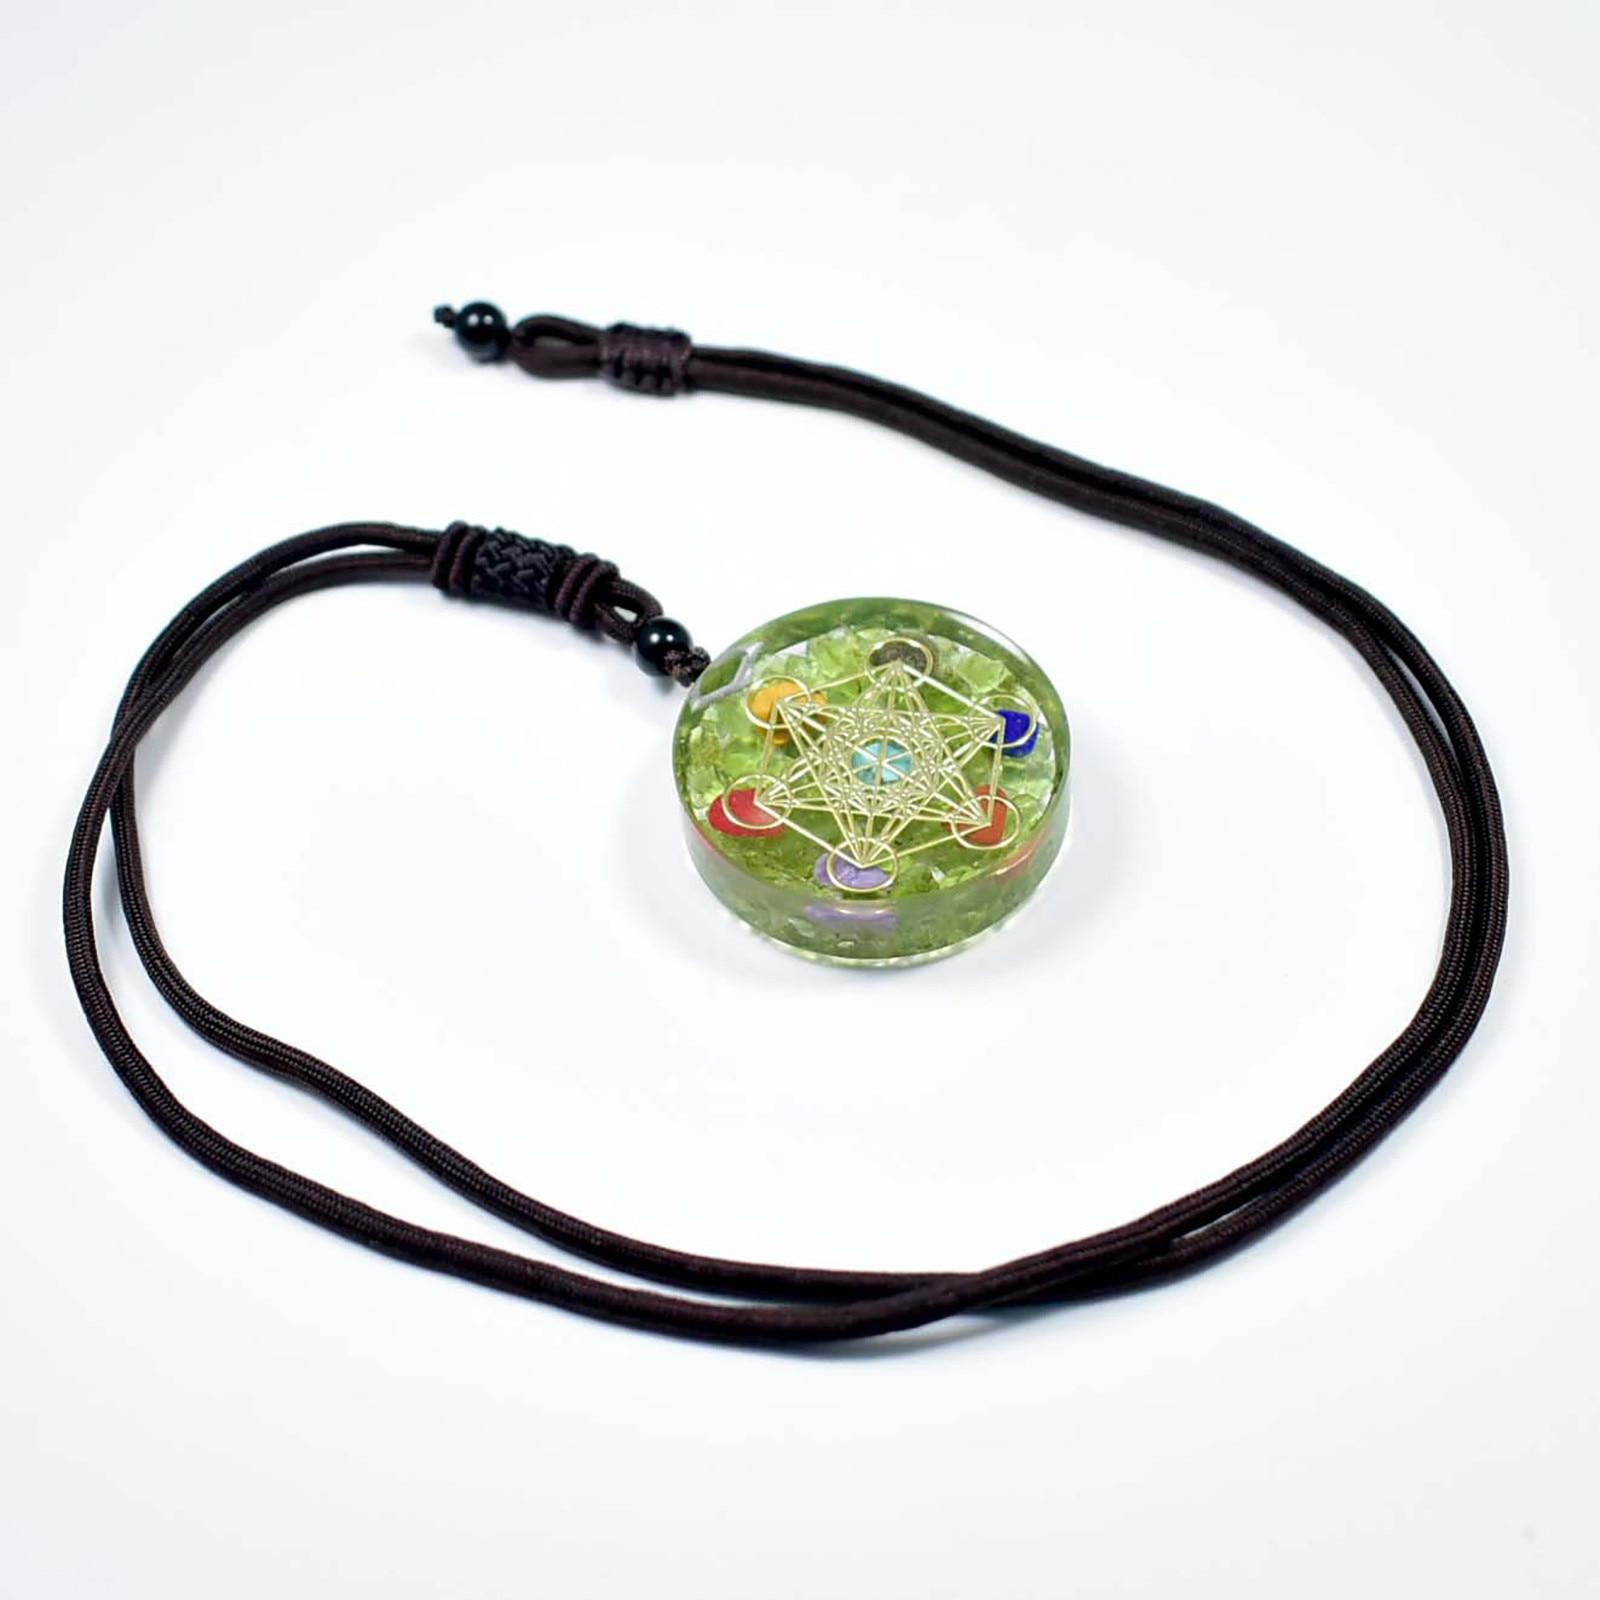 Necklace Ogan Energy Magic Circle Pendant Natural Peridot Resin Seven Chakra Pendant Chain necklace jewelry Bijoux Femme